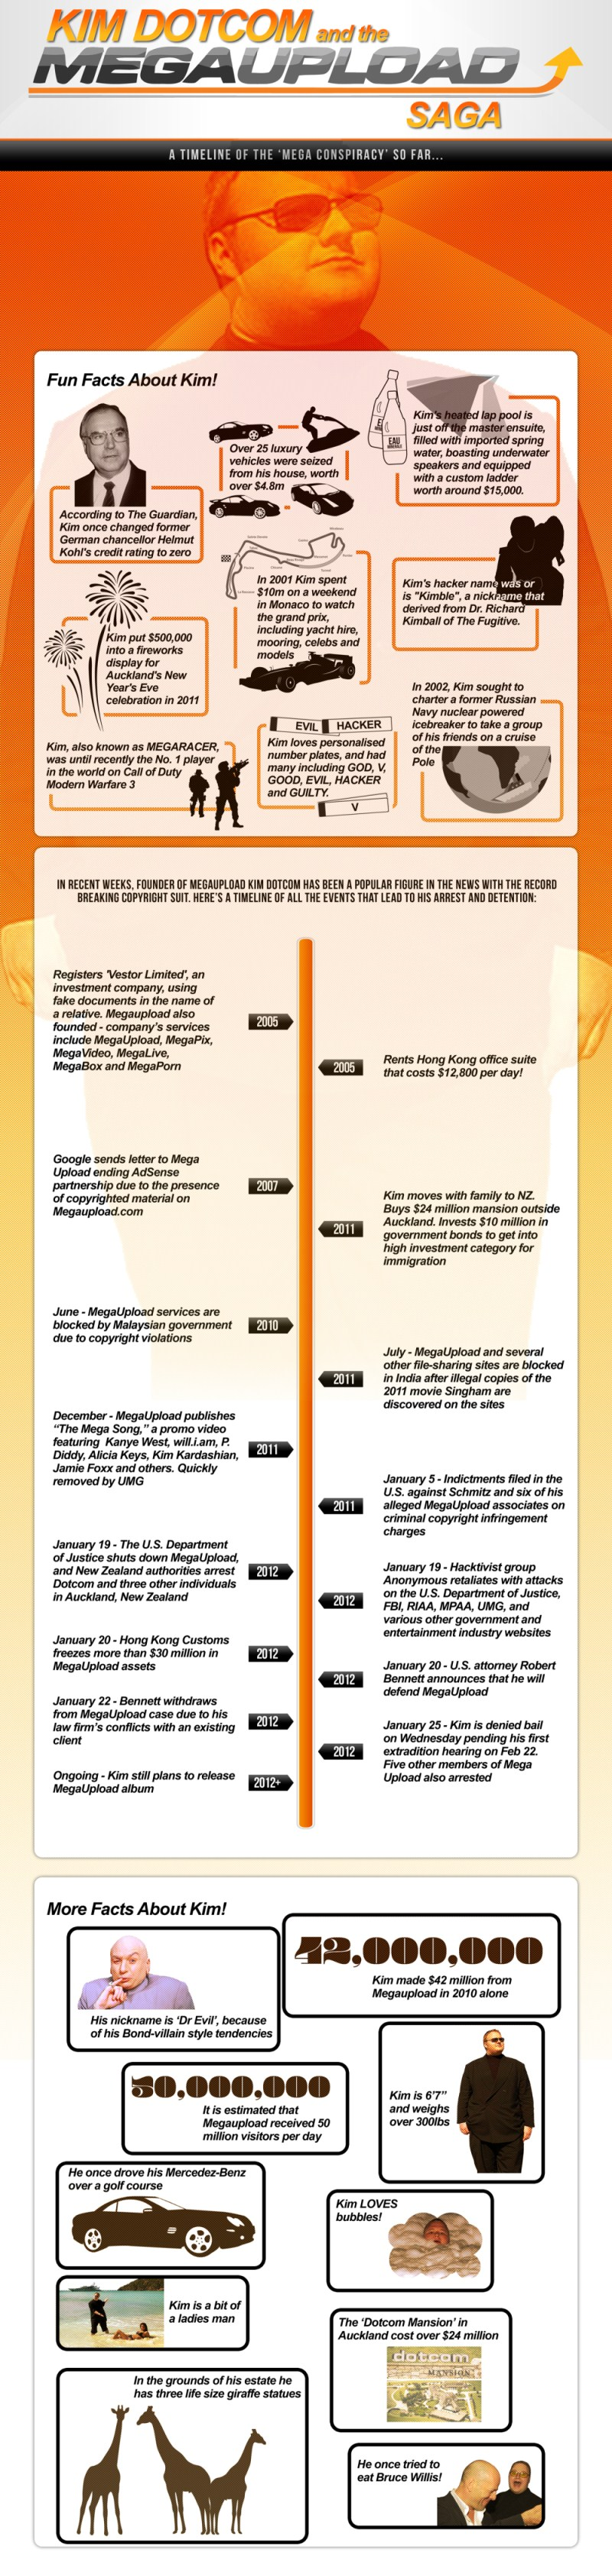 KimDotcomMegaupload - Kim DotCom, sa vie, sa luxure [Infographique]